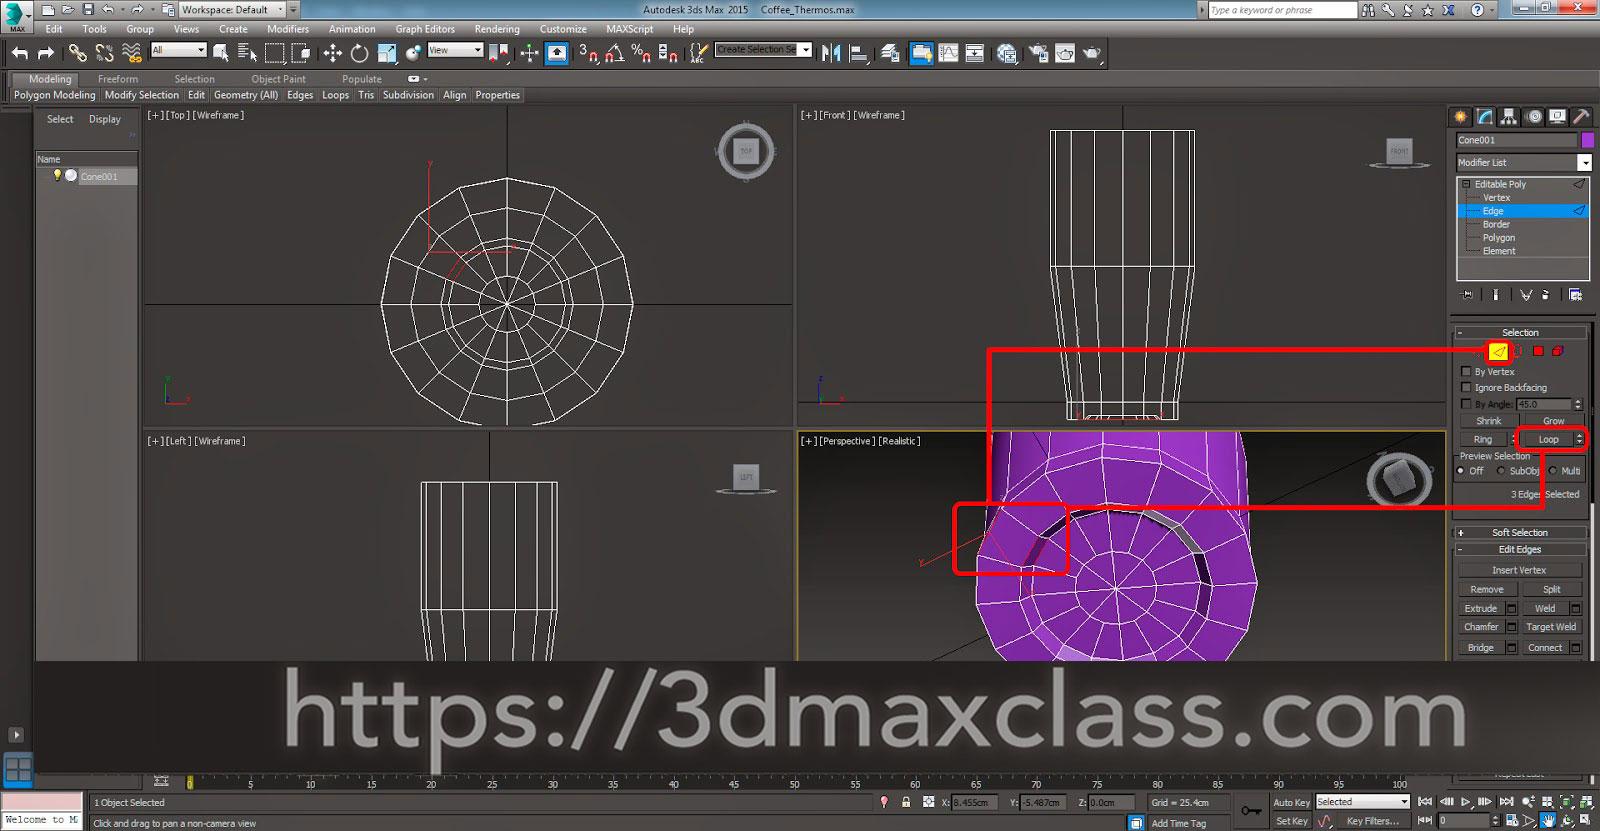 3dmax 1 1 15 1 - آموزش مدل سازی ماگ قهوه در تری دی مکس